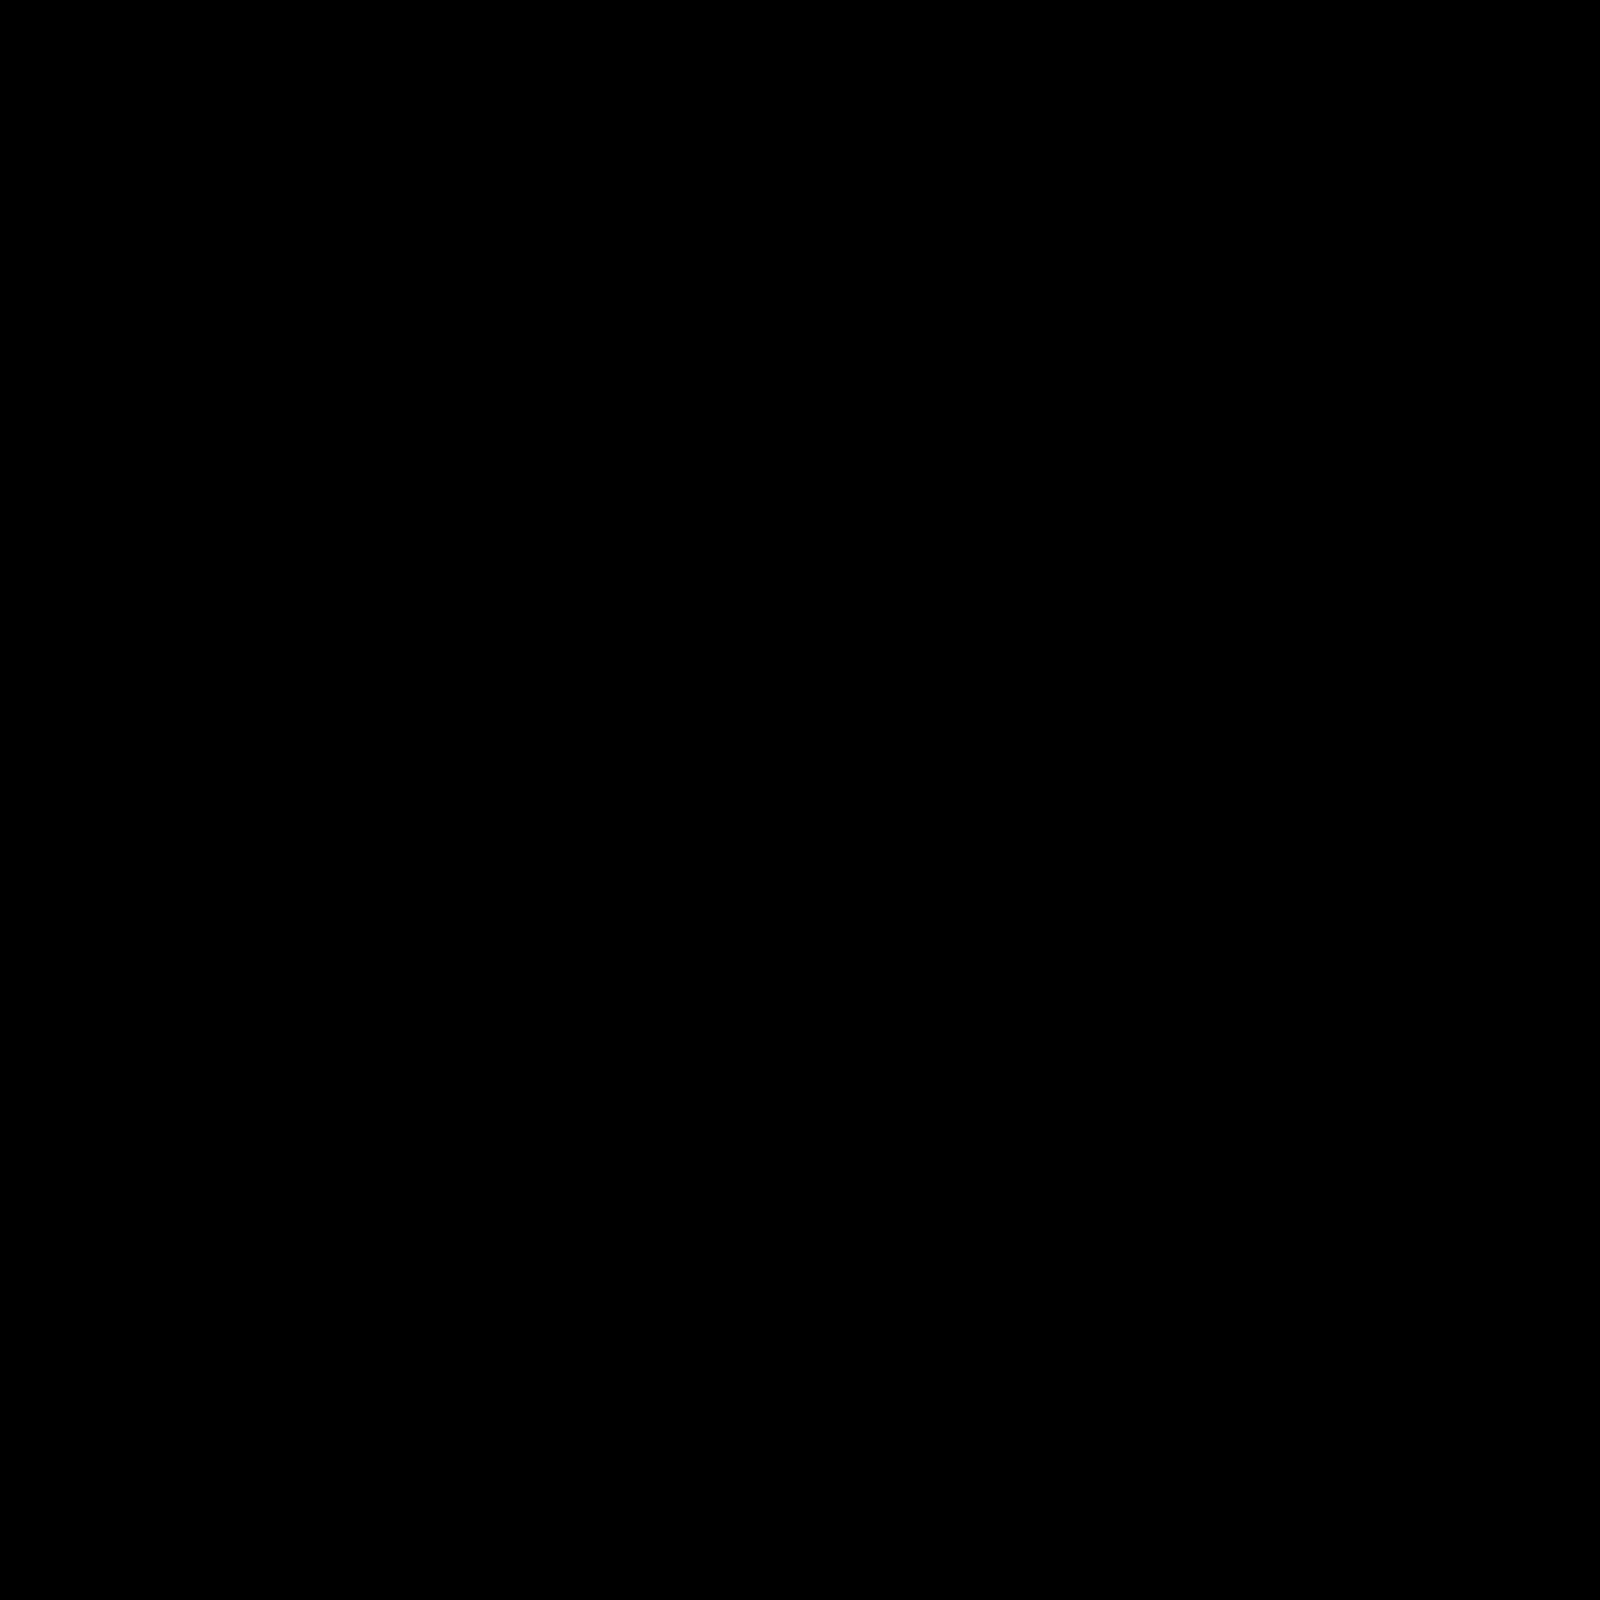 Acordeón icon